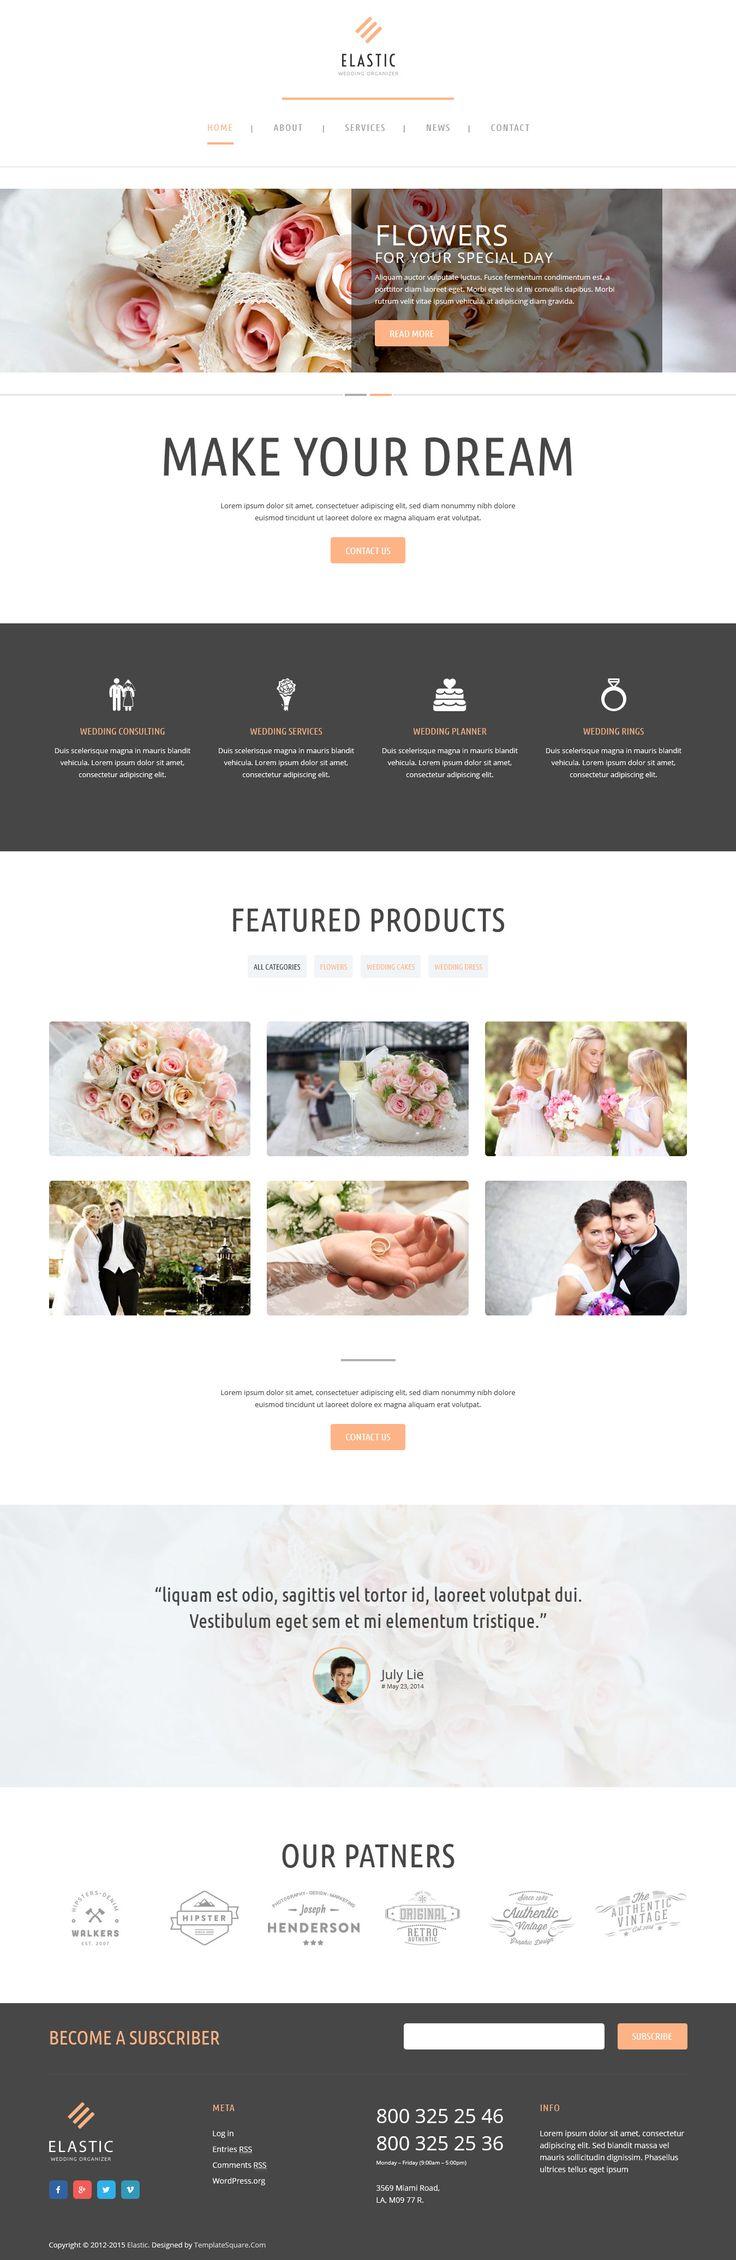 858 best Wordpress Themes images on Pinterest   Wordpress template ...